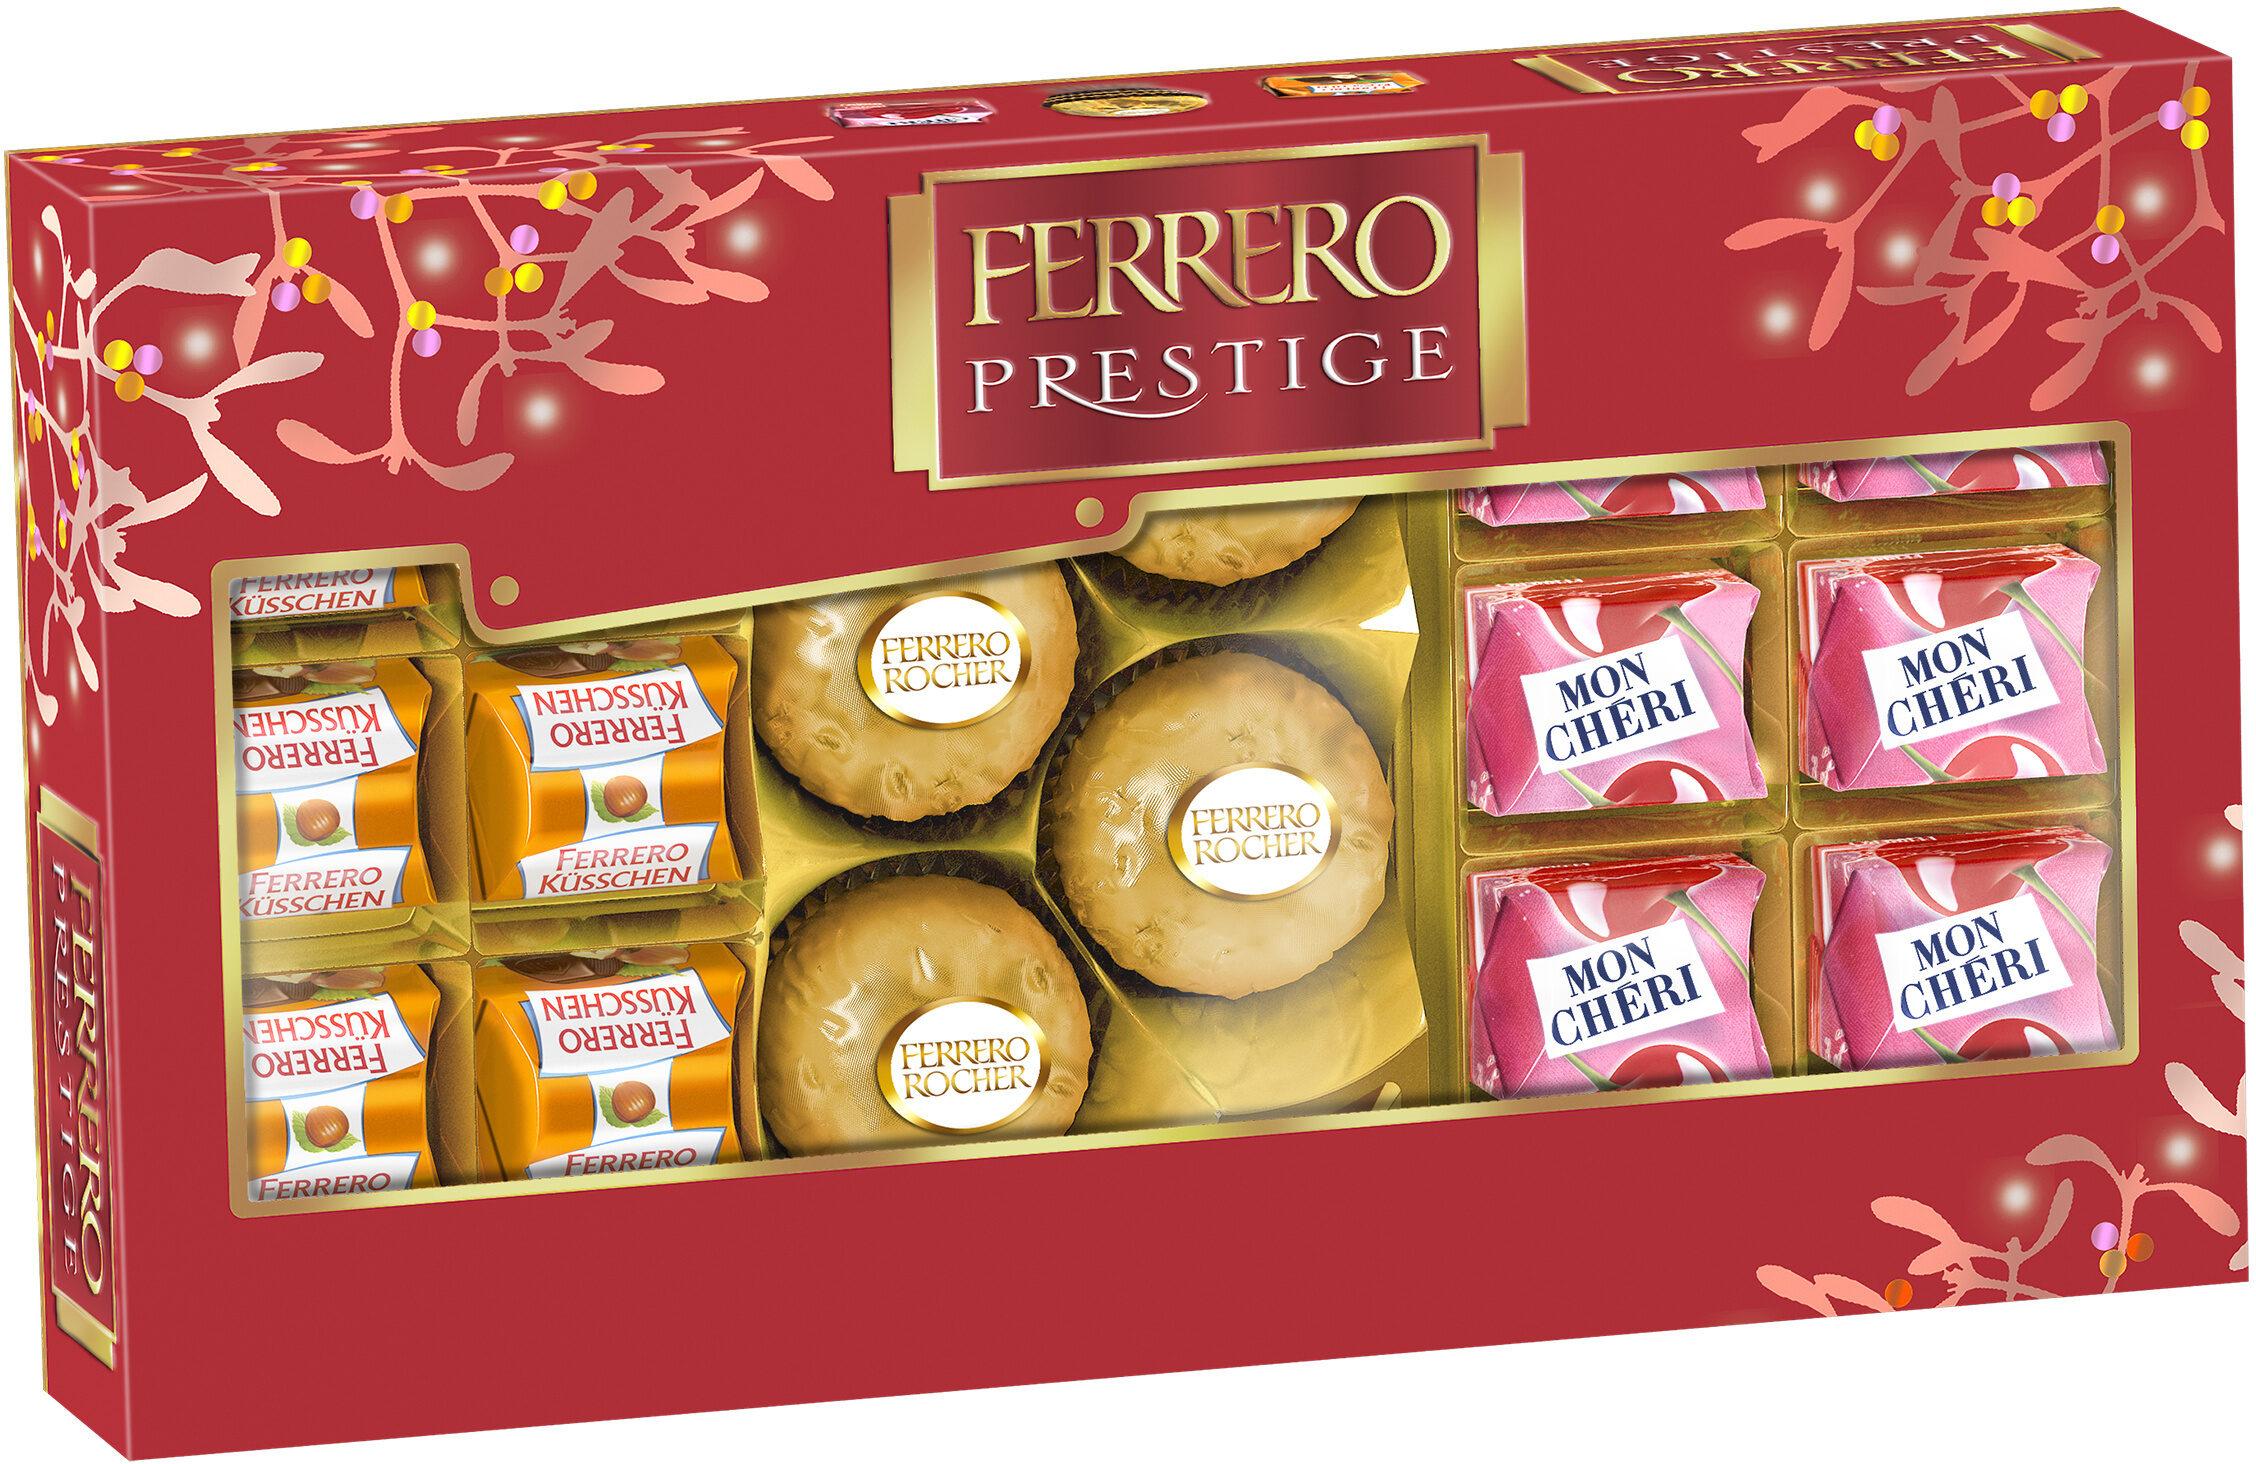 Ferrero prestige assortiment de chocolats boite de 16 pieces - Produit - fr